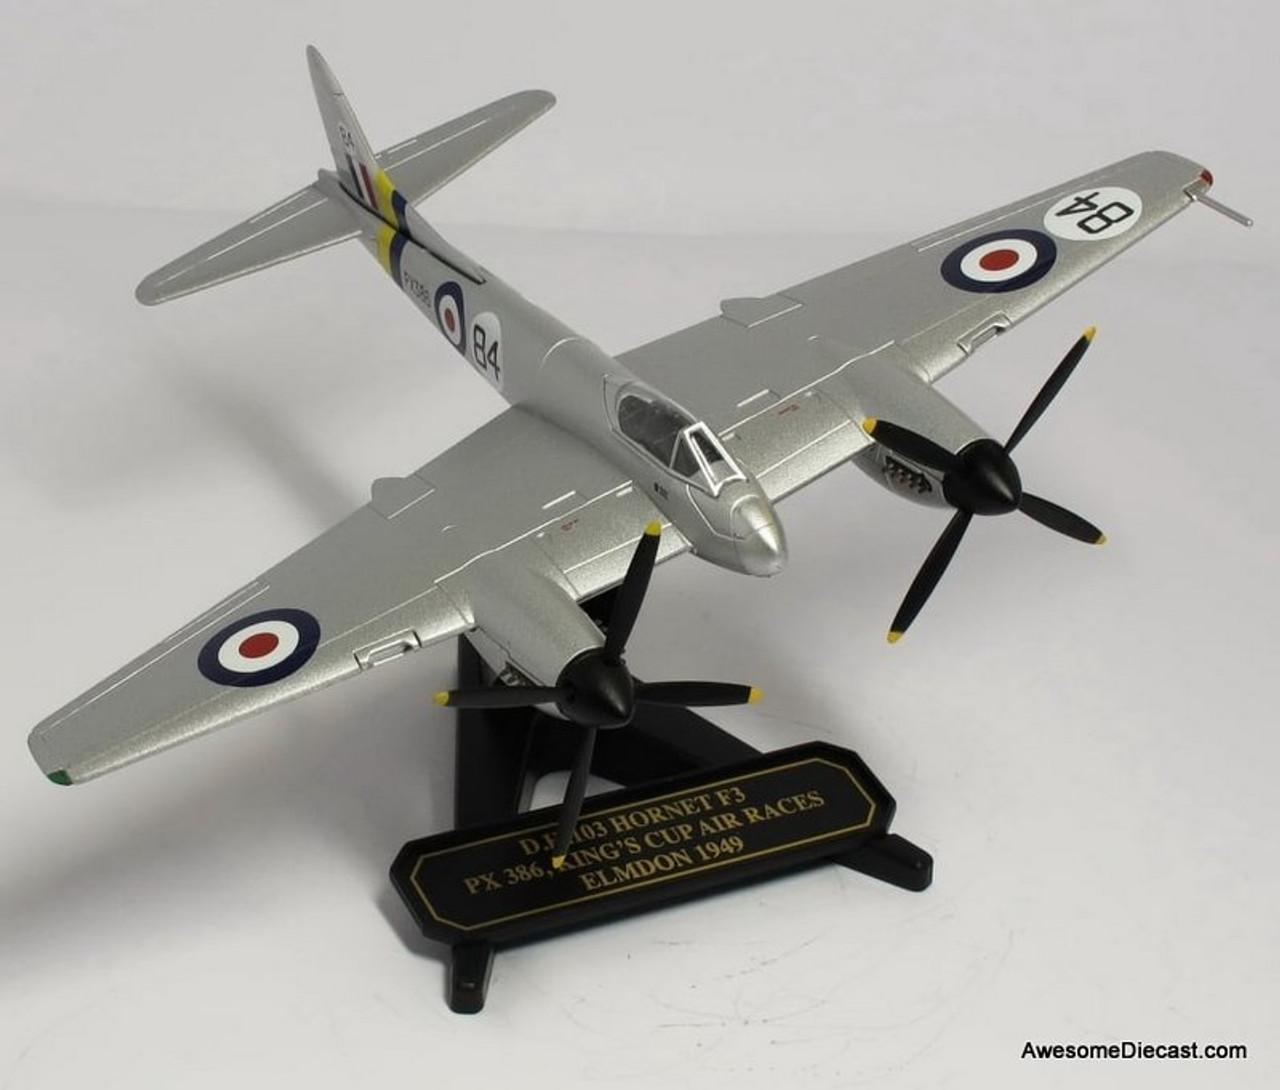 Oxford 1:72 De Havilland Hornet F3 Reg PX 386: Kings Cup Air Race